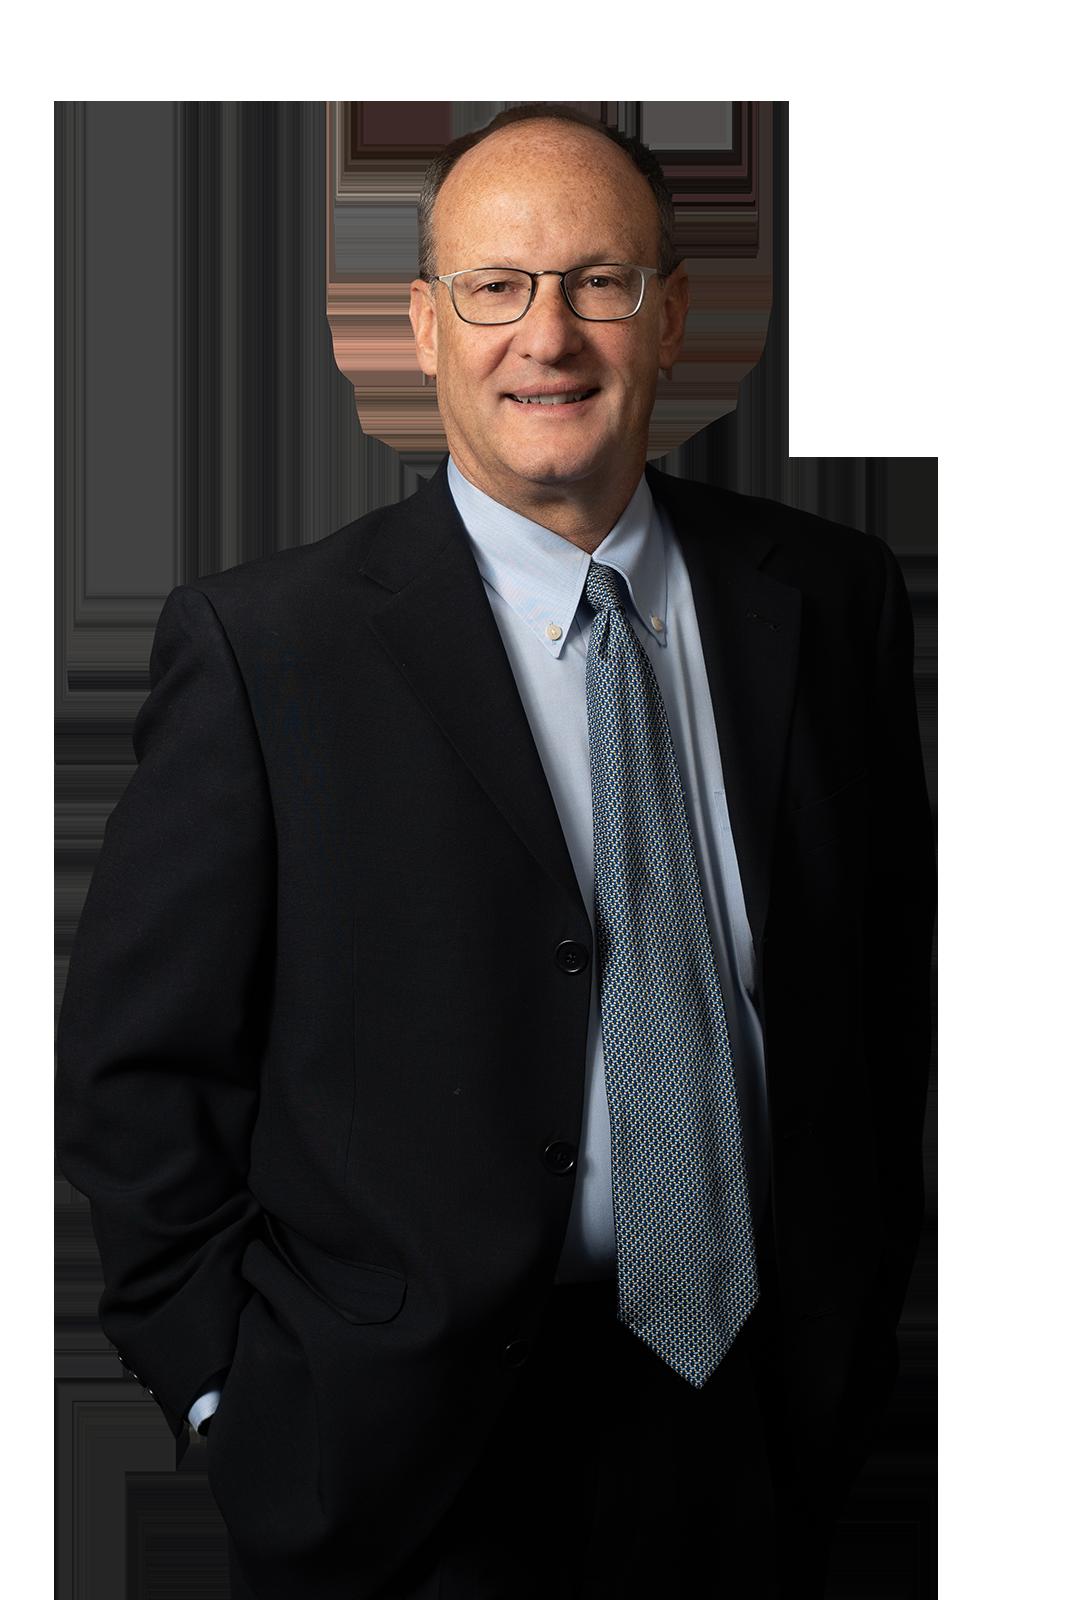 Gary B. Shulman